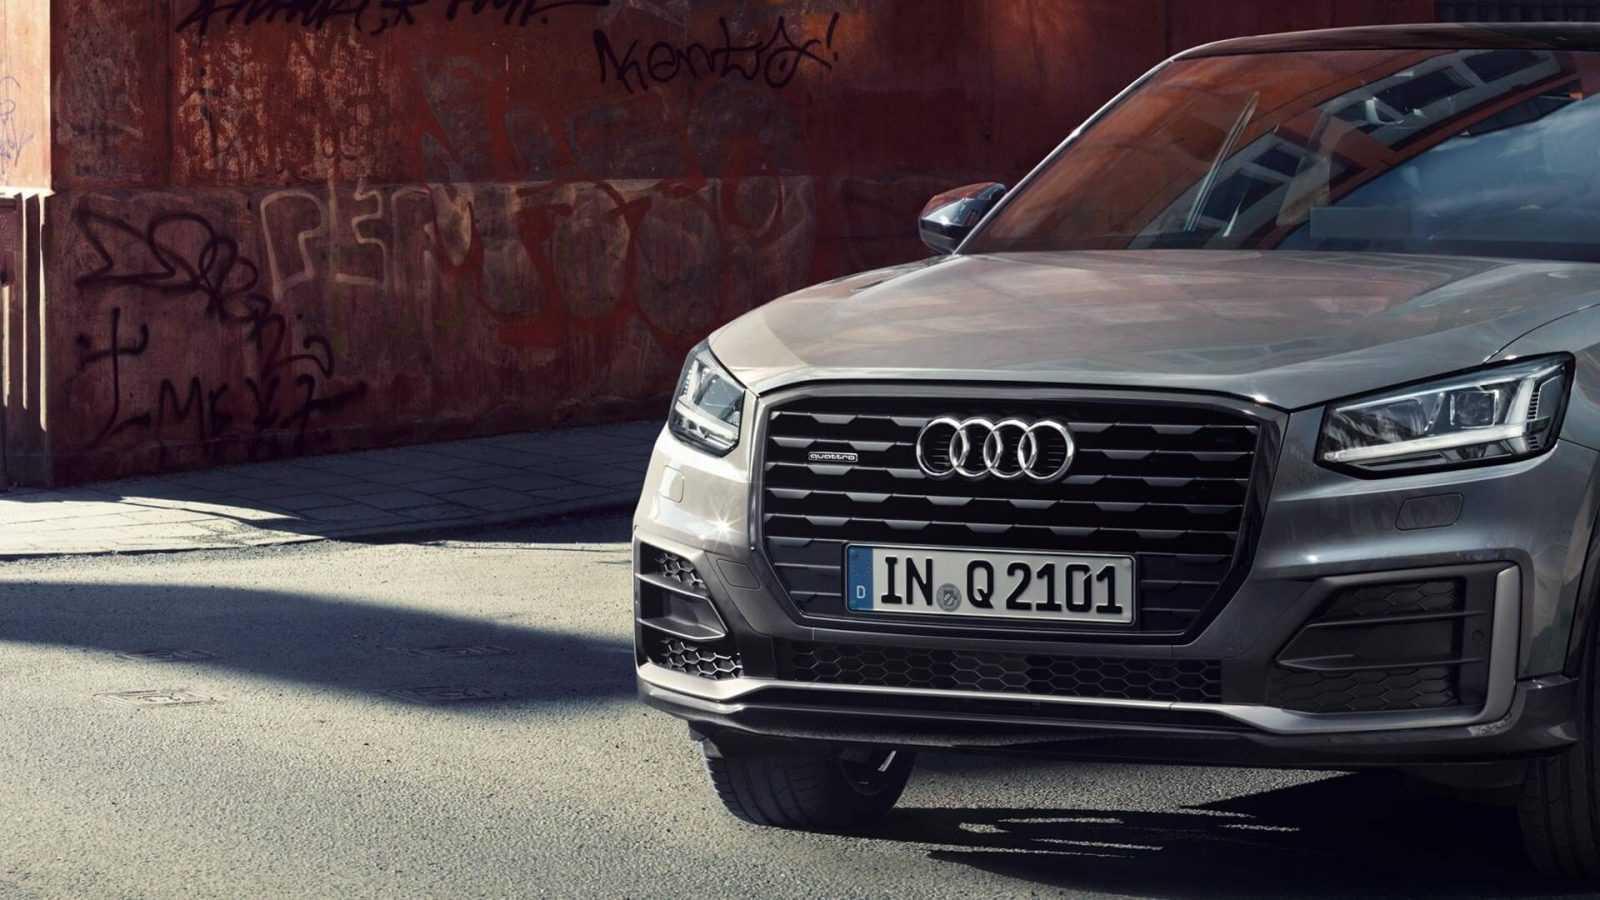 Audi Q2 eksterjers